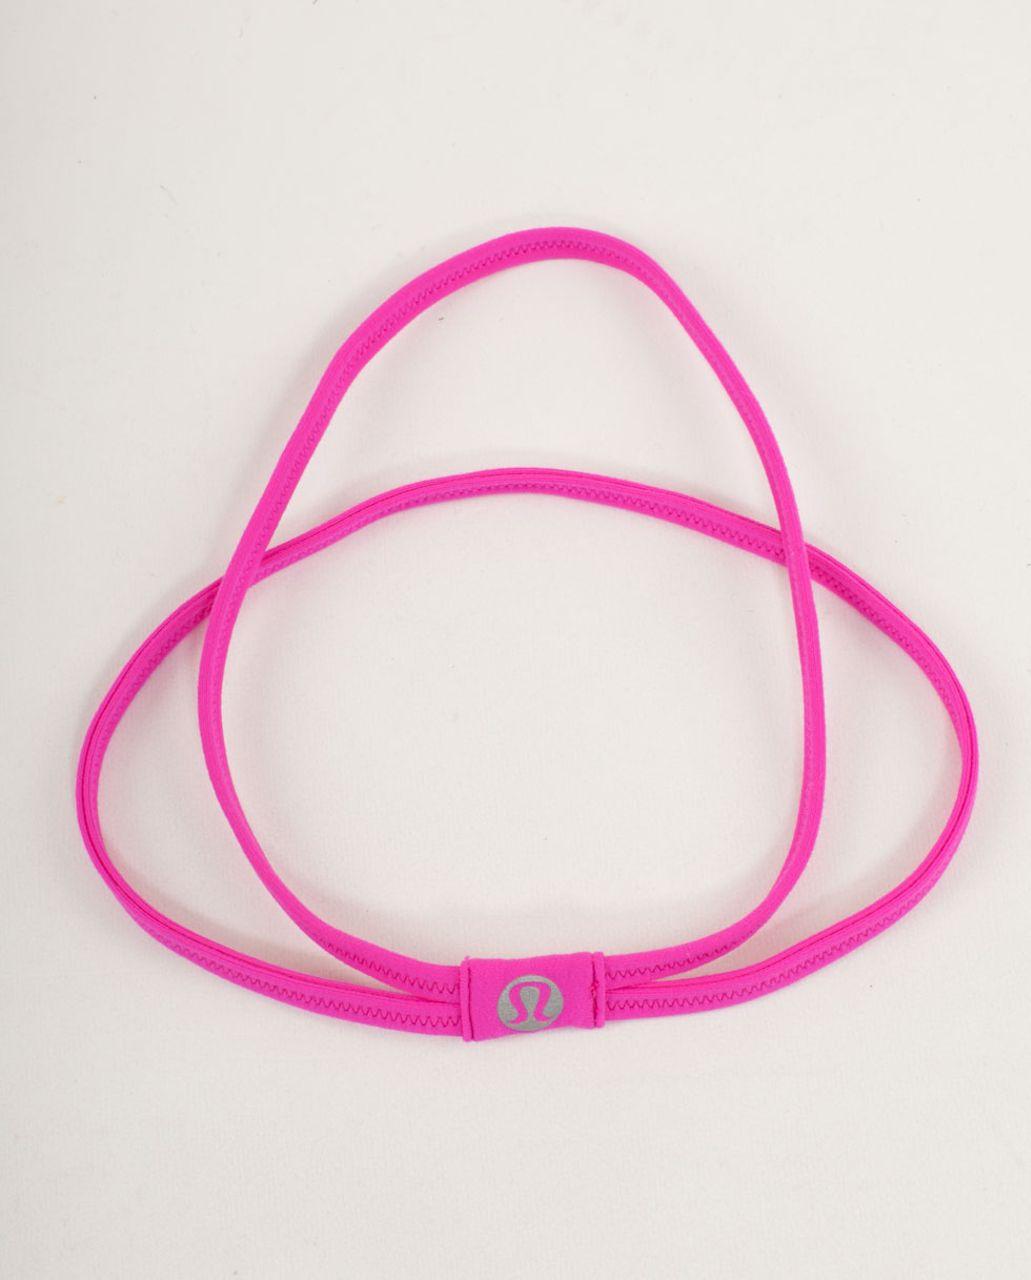 Lululemon DANCE! Headband - Paris Pink